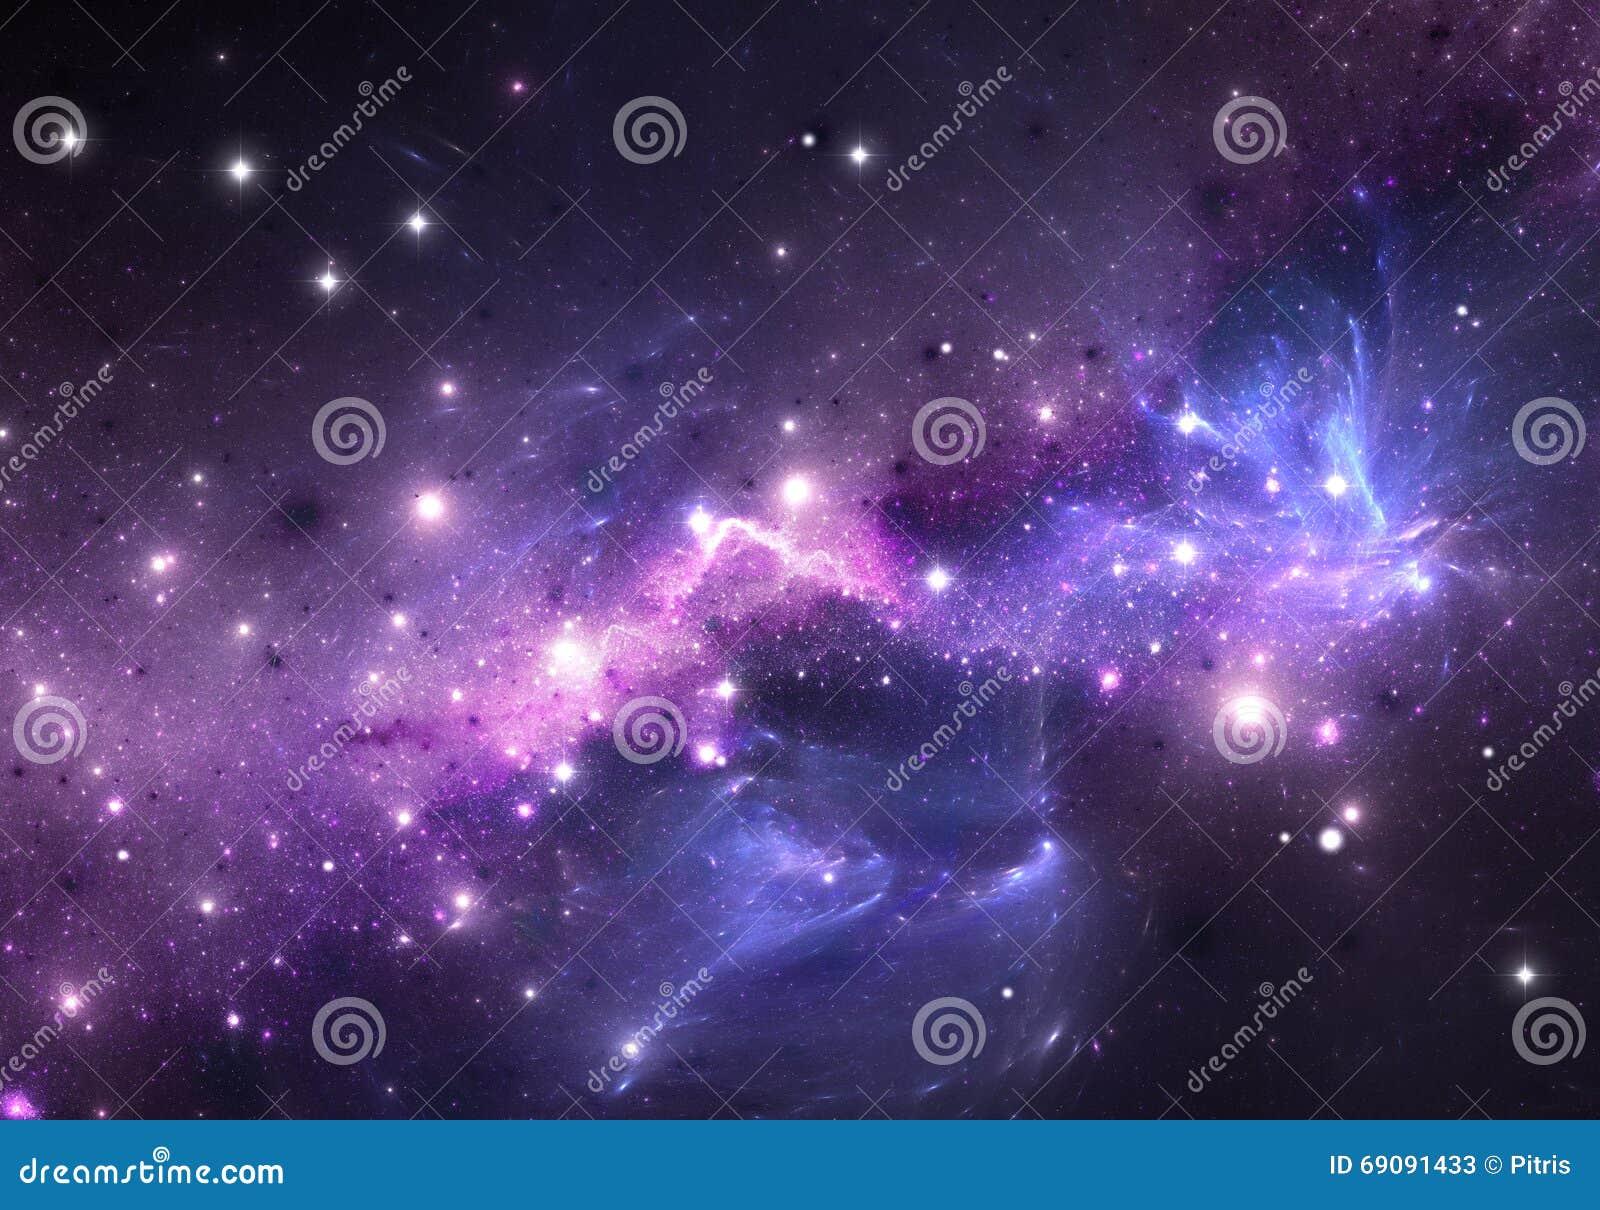 Purple nebula and stars  stock illustration  Illustration of